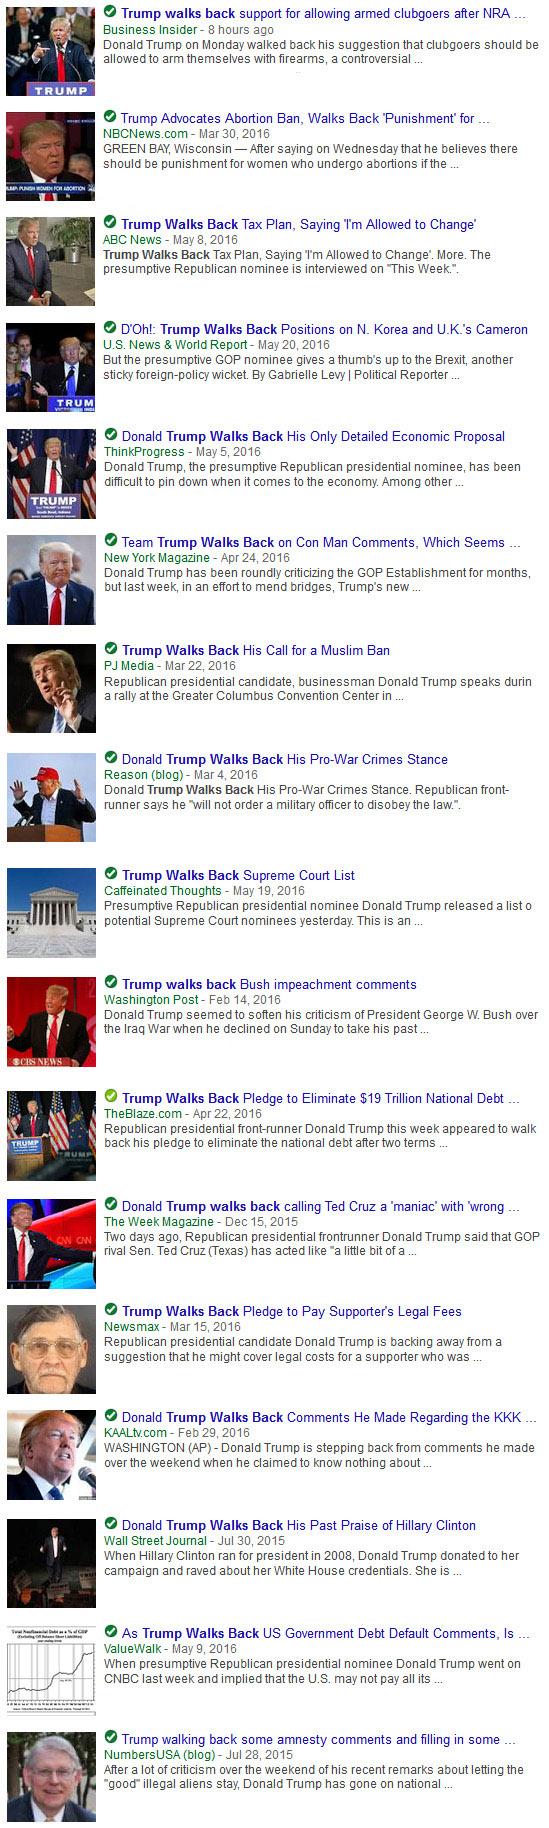 blog_trump_walk_back_0